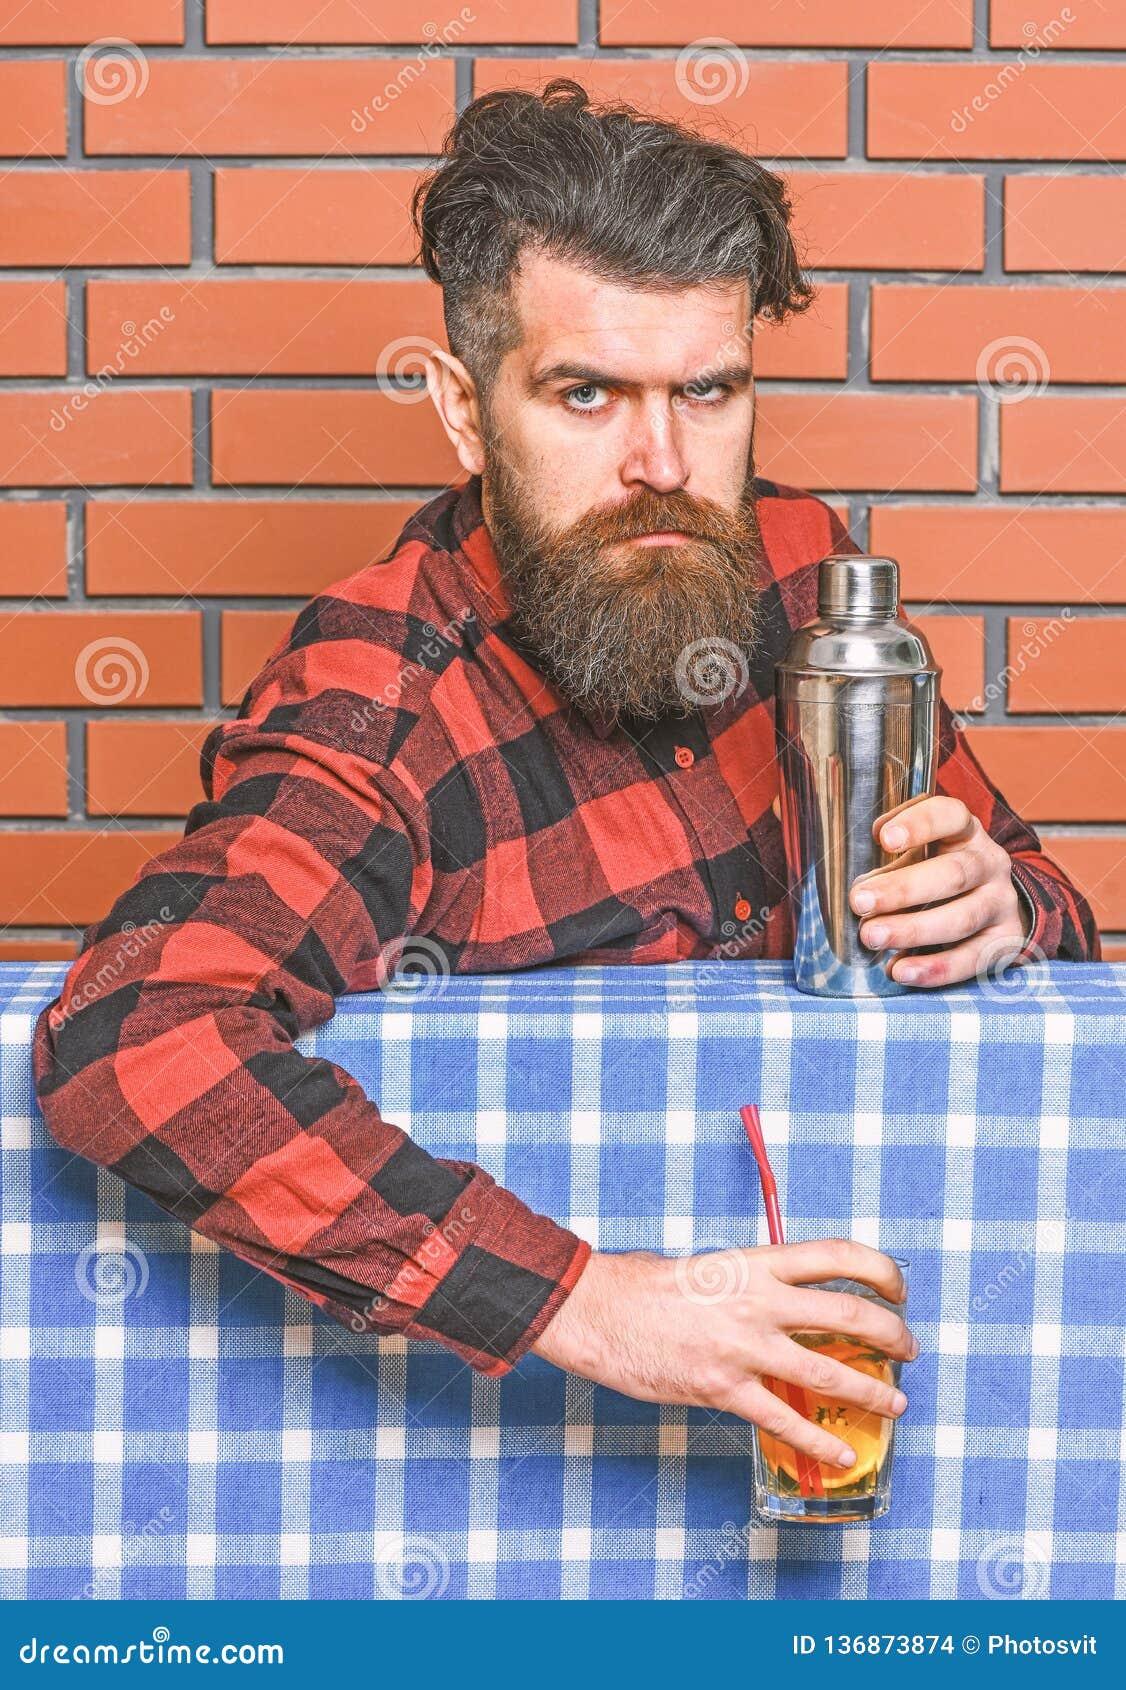 Bartender έννοια Μπάρμαν με τη μακριά γενειάδα και mustache και μοντέρνη τρίχα στον ακριβή δονητή εκμετάλλευσης προσώπου, που γίν